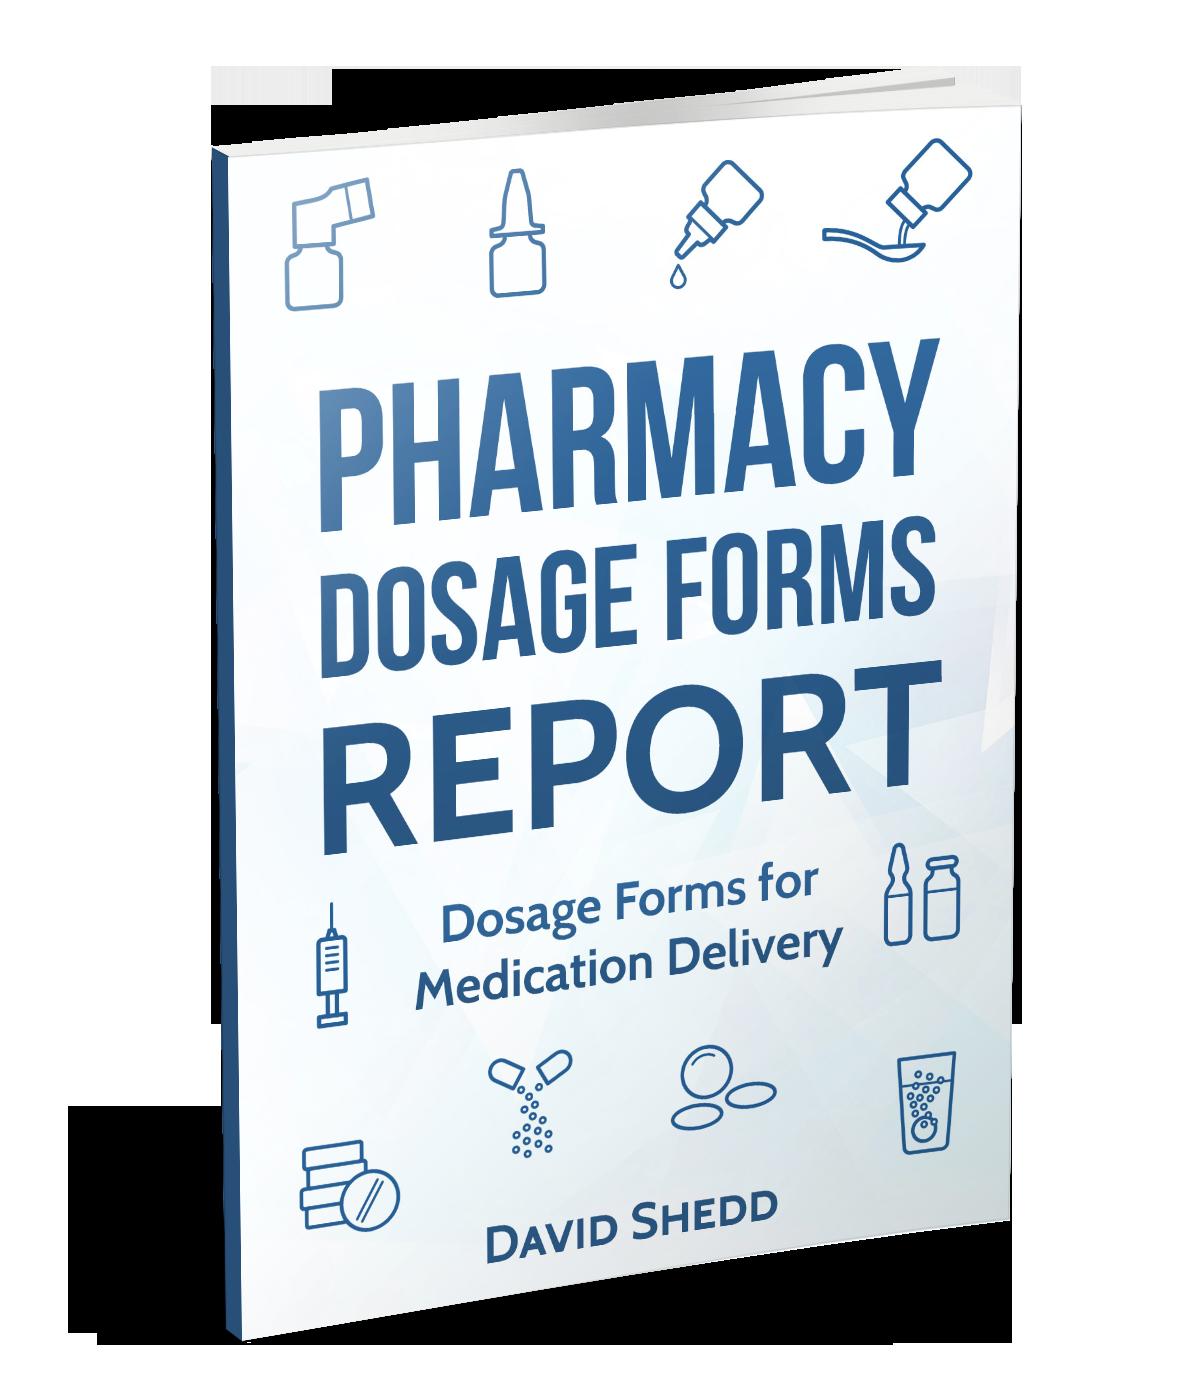 Pharmacy tech resources com. Pharmacist clipart prescription vial